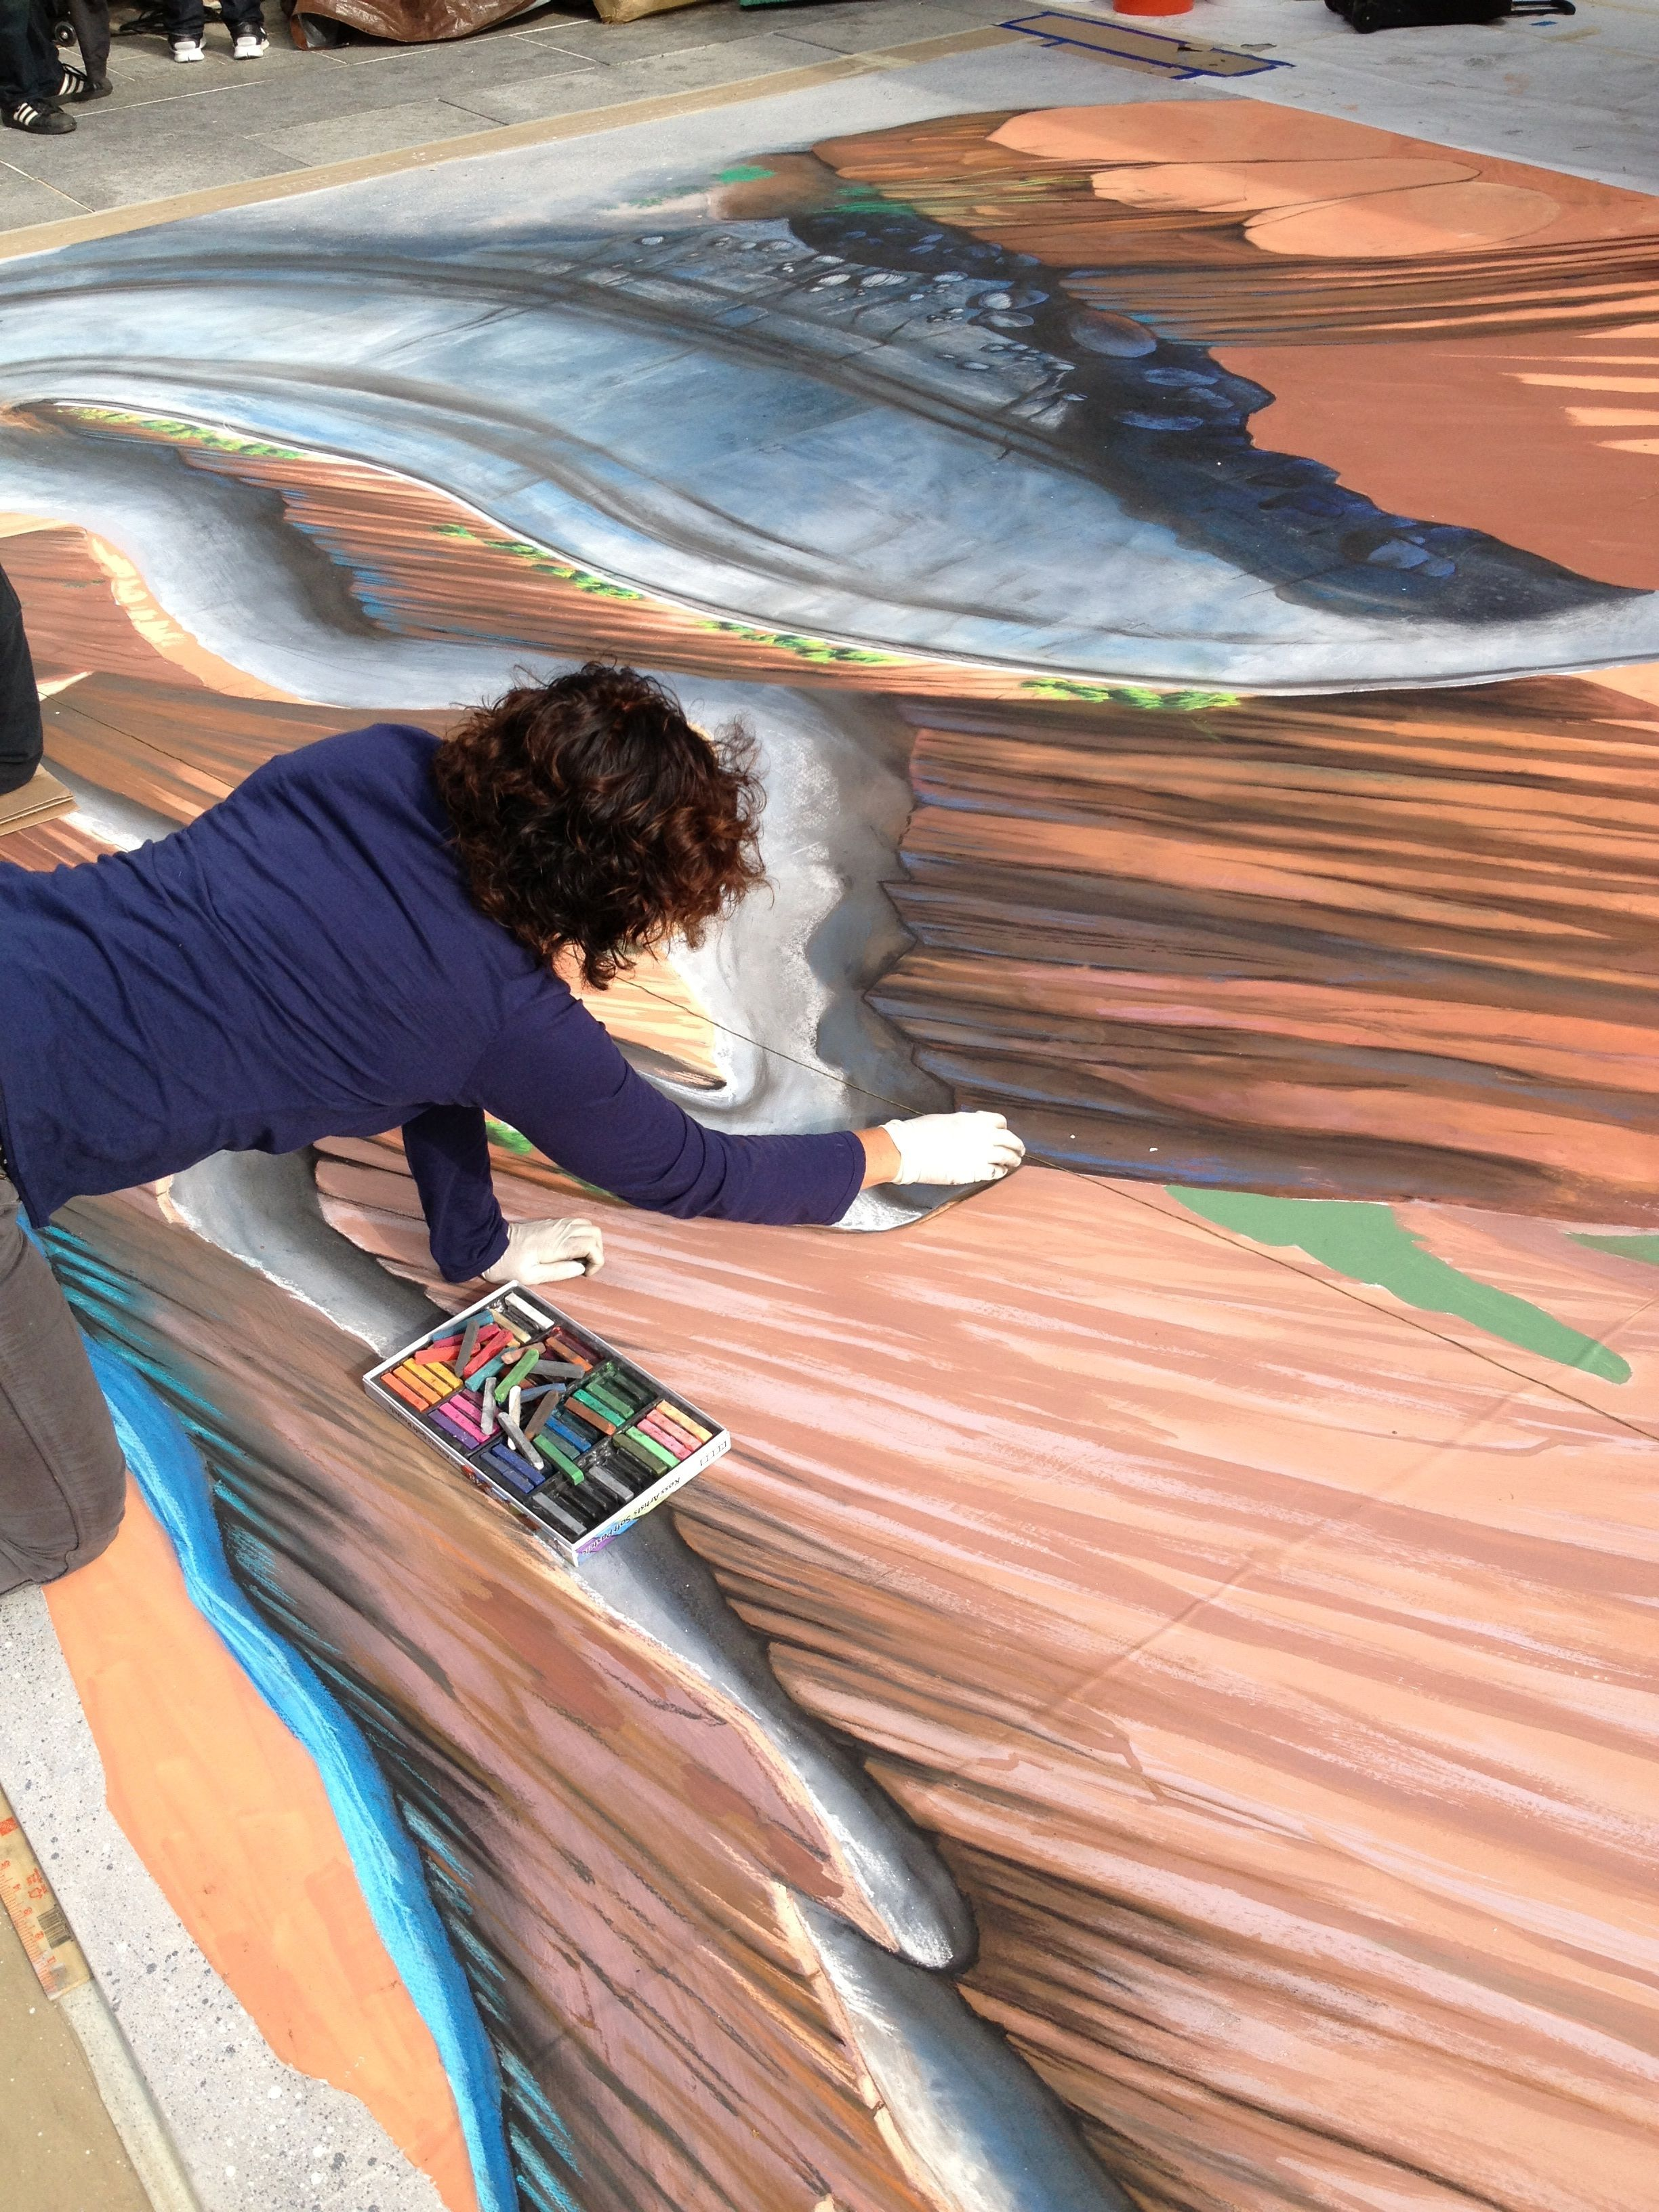 Tracyleestum 3dchalkart  streetpainting streetart ATS Grandesign cadillac  AugmentedReality